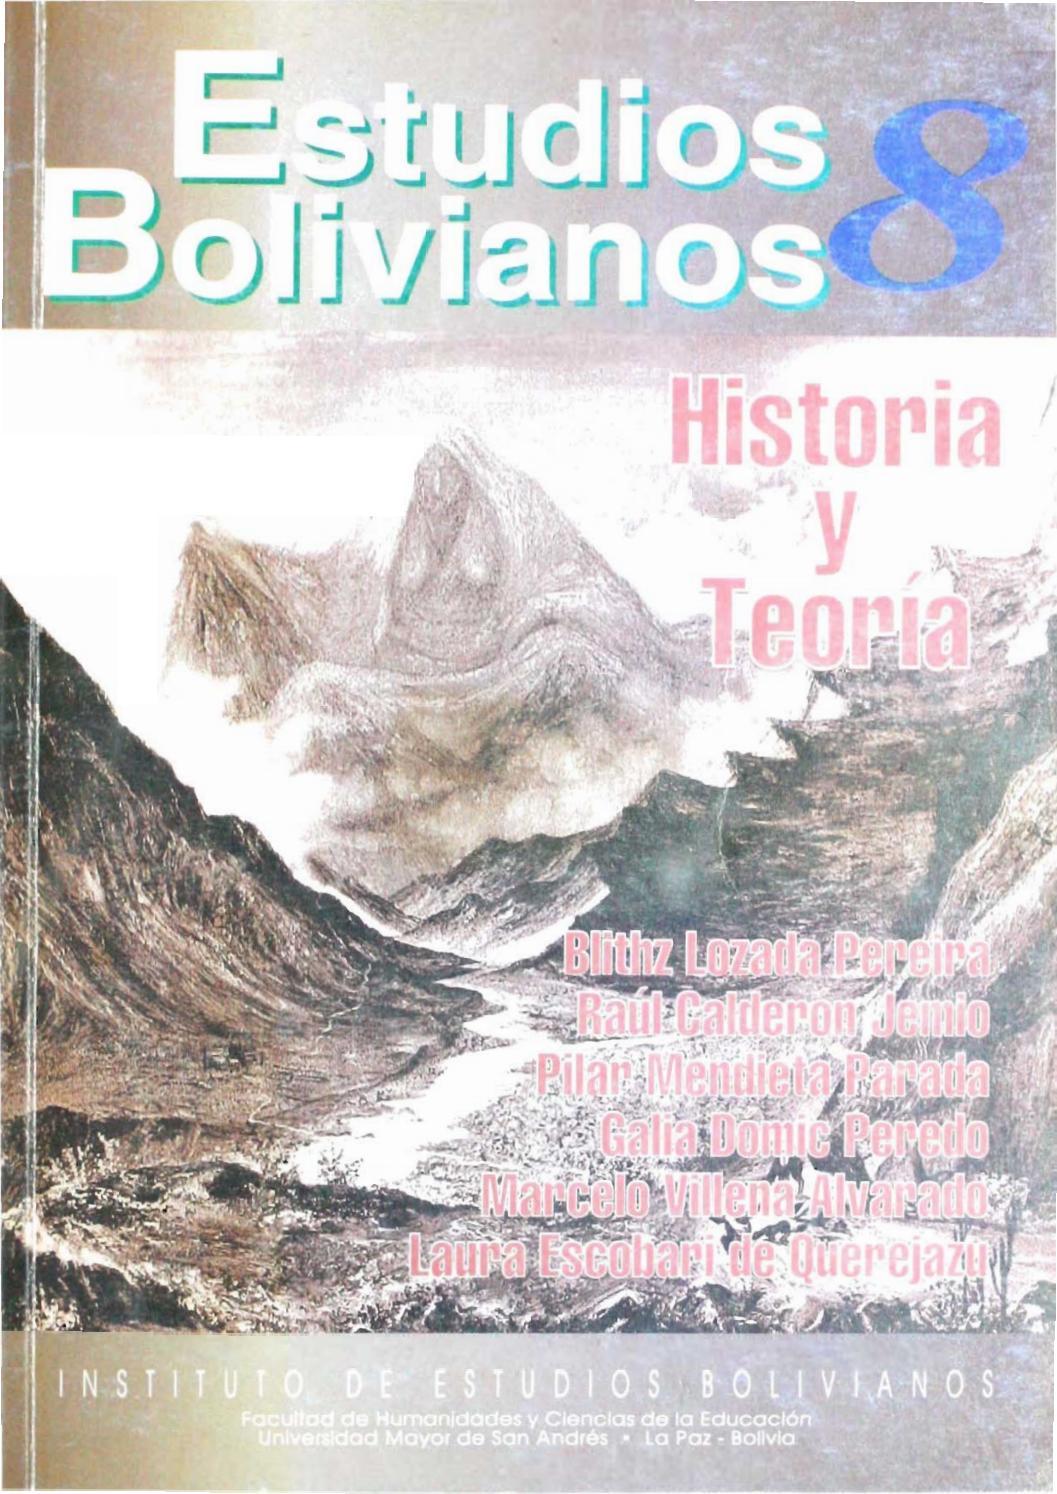 Estudios Bolivianos 008 by Postgrado Humanidades UMSA - issuu